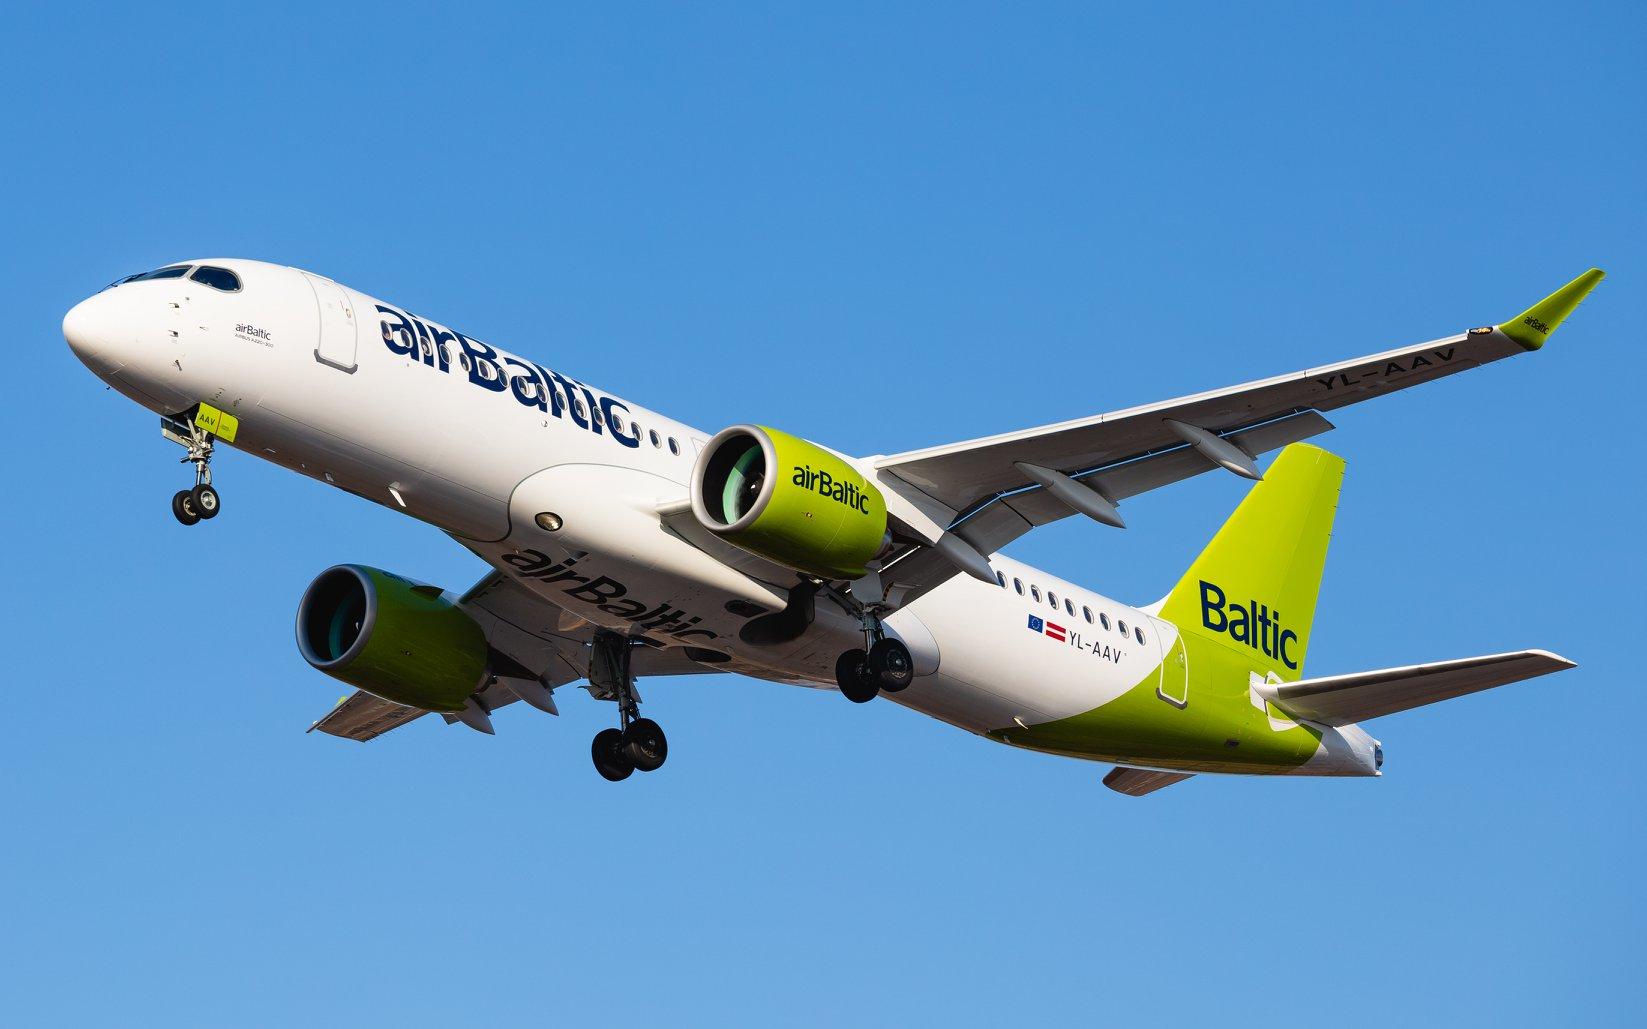 AirBaltic #новости Airbaltic, авиарейсы, Латвия, Рига